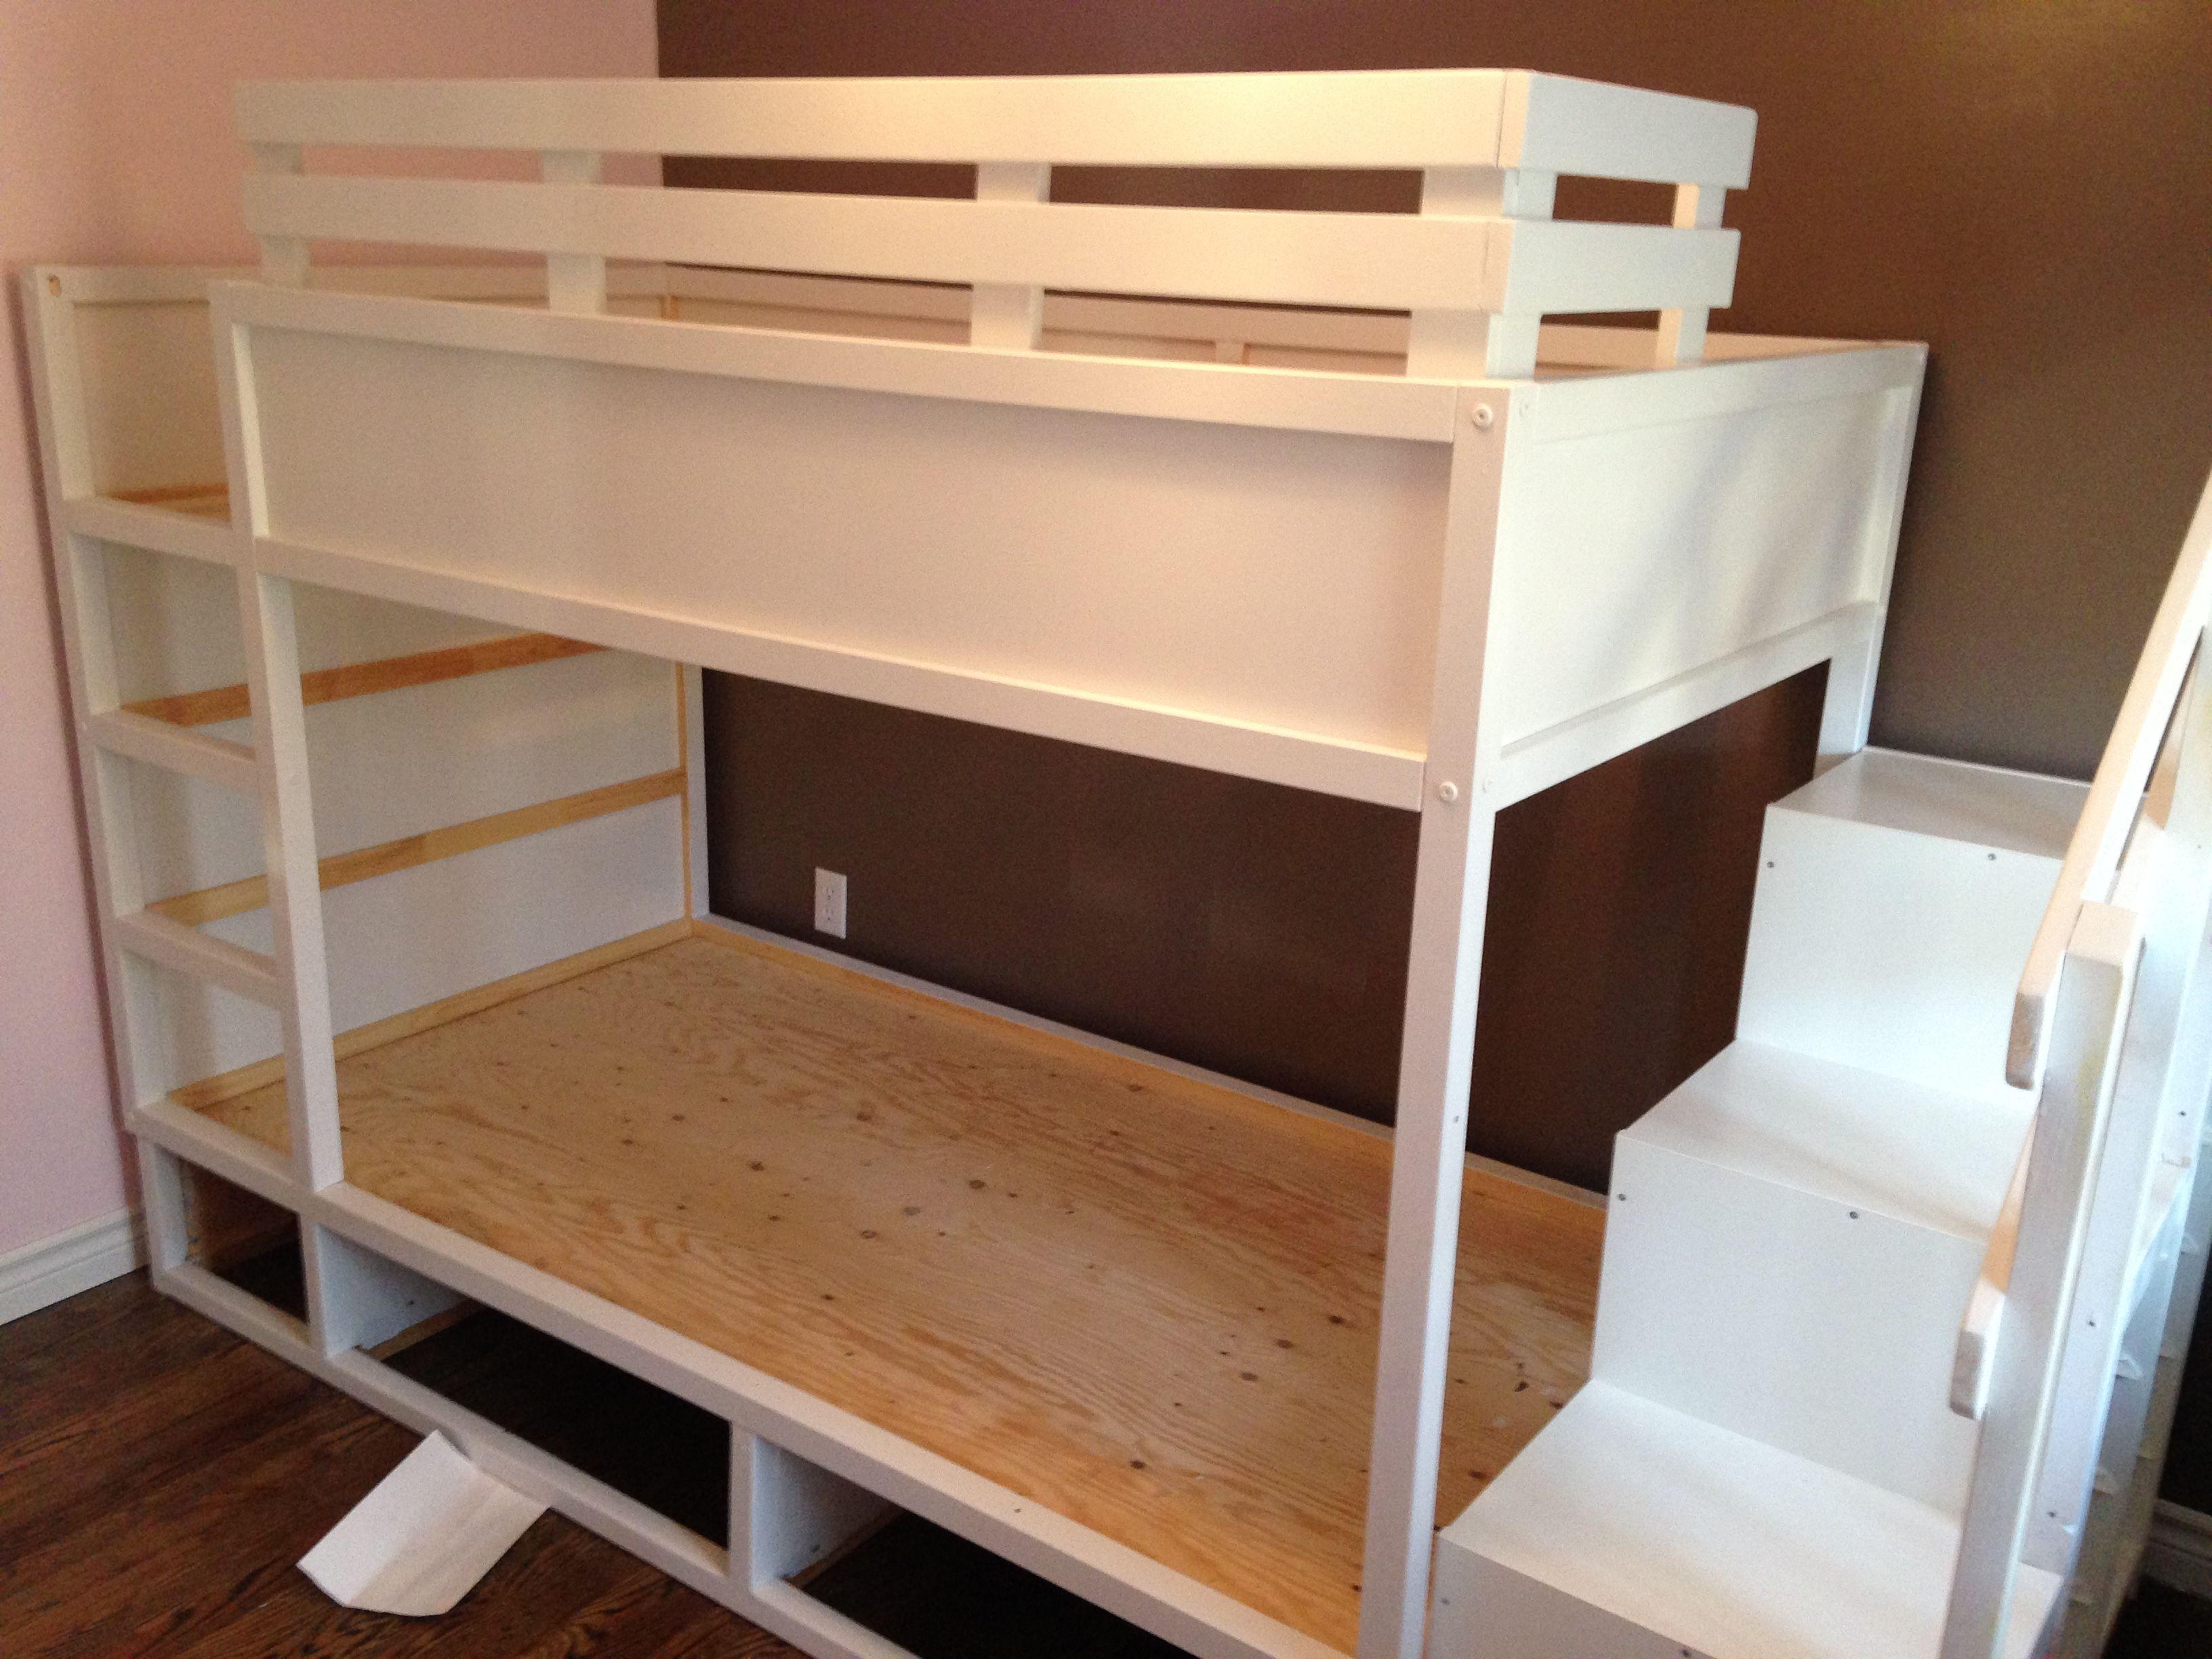 Ikea Kura Bed Makeover Bunk Bed Ikea Kura Bett Kinder Zimmer